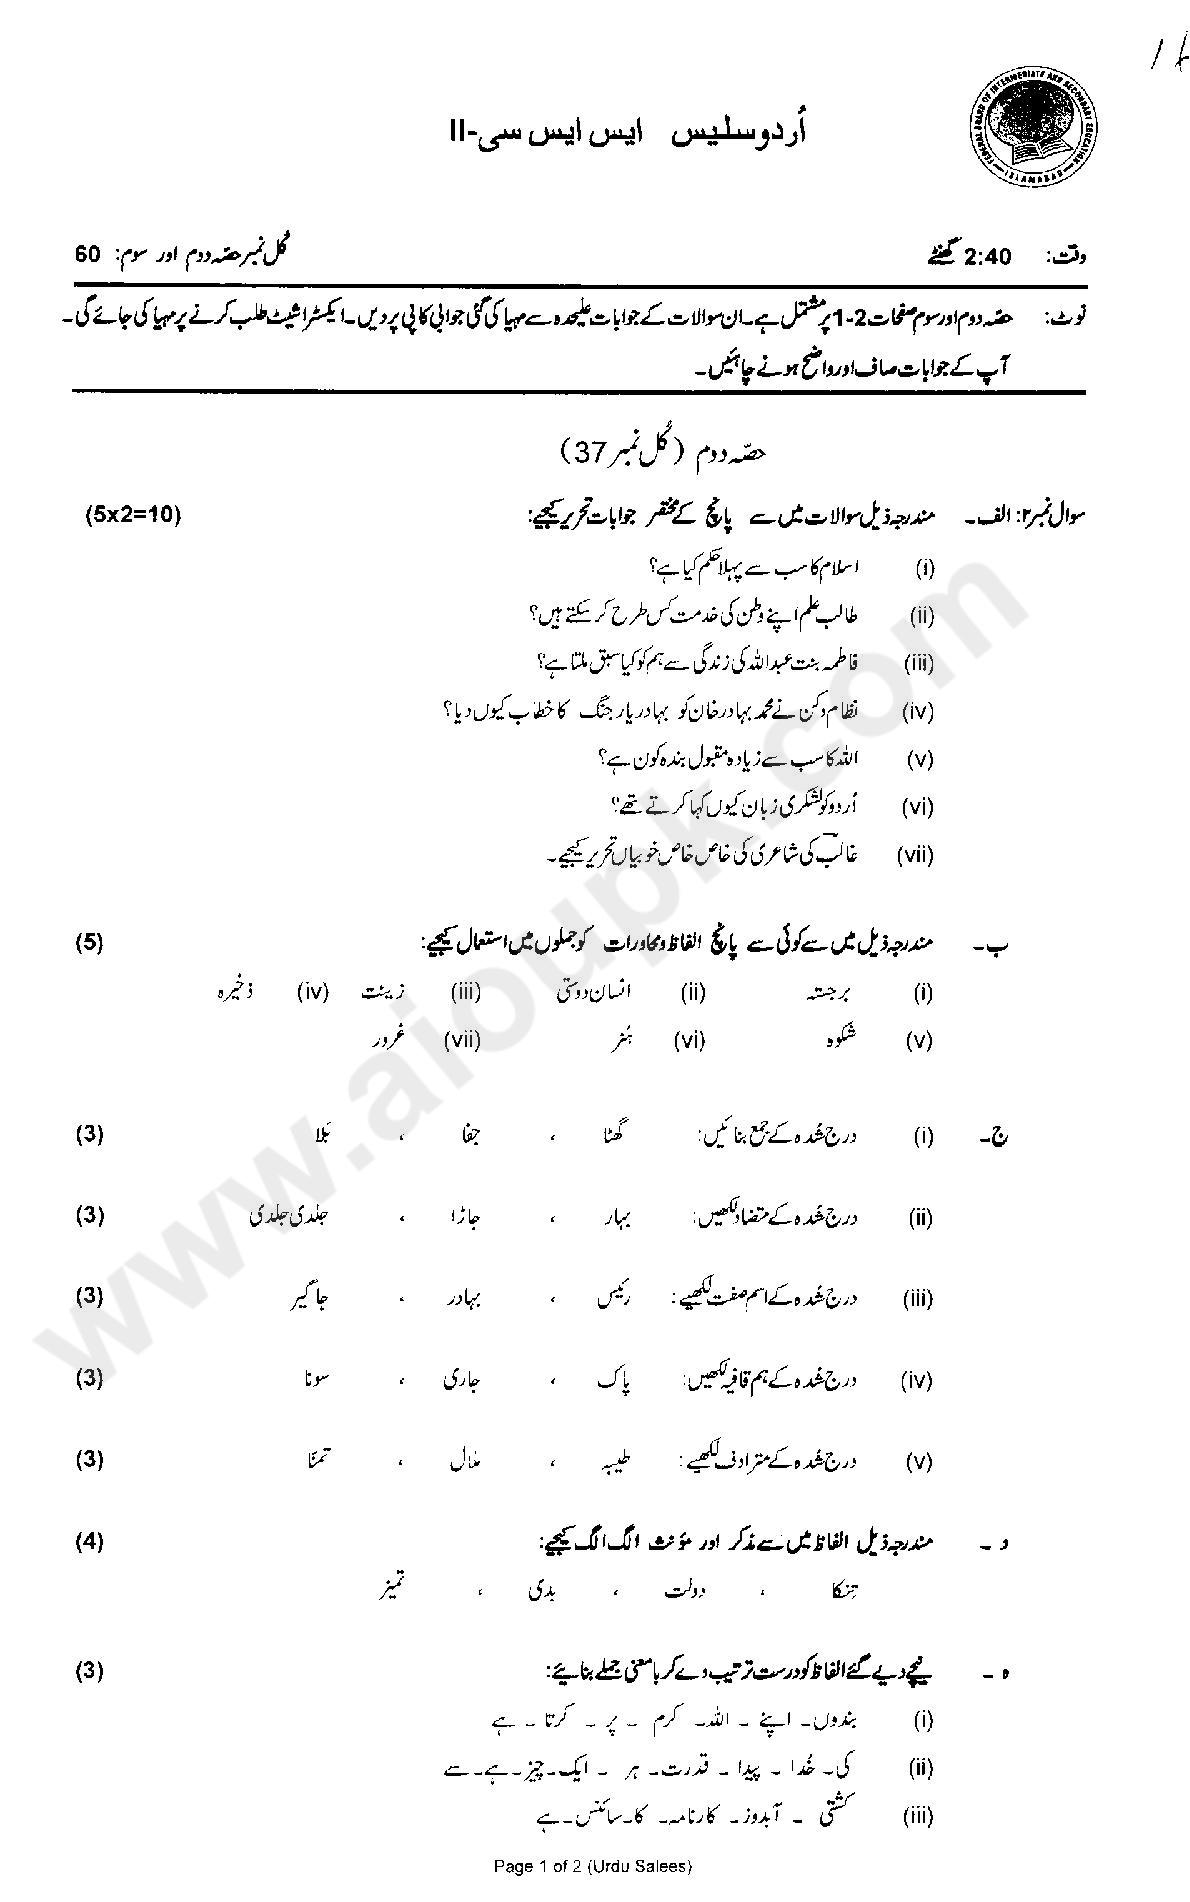 urdu essays for matric Urdu essays for class 12 essay on corruption 250 words 2006 2008 sri gnanananda matric essays survey chapter_12 find them anywhere botany, pakistan studies survey chapter_12 find them anywhere botany, pakistan studies.